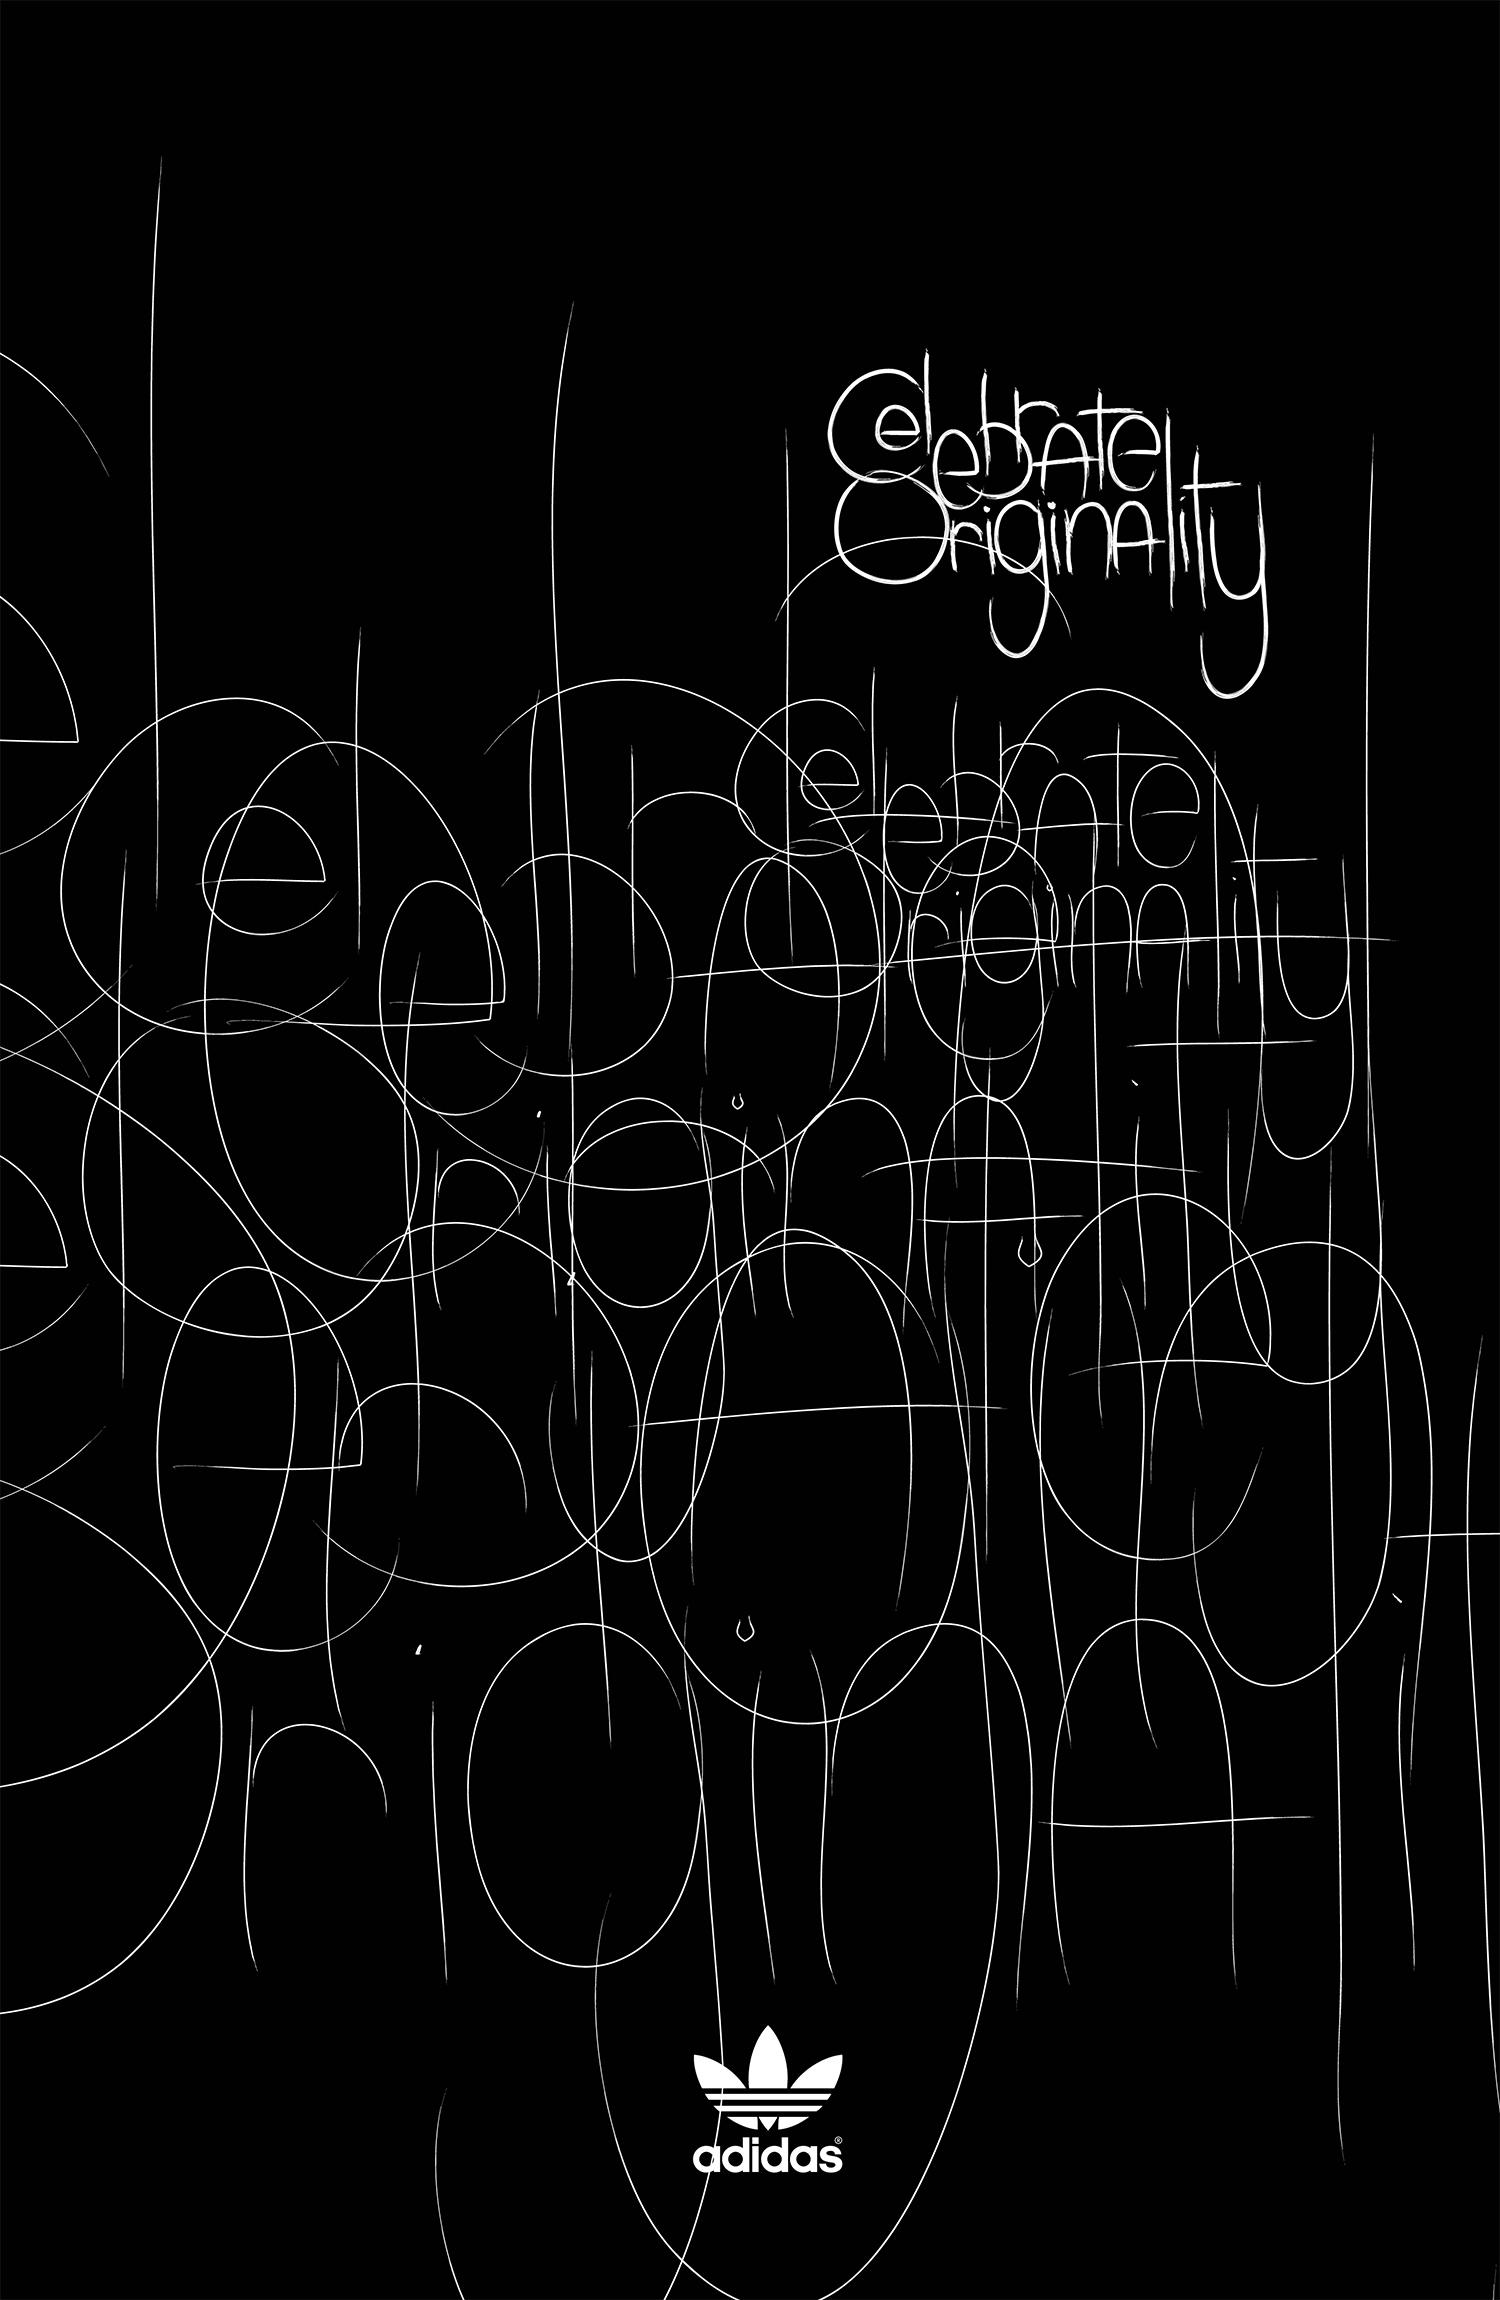 Celebrate-Originality-11.jpg